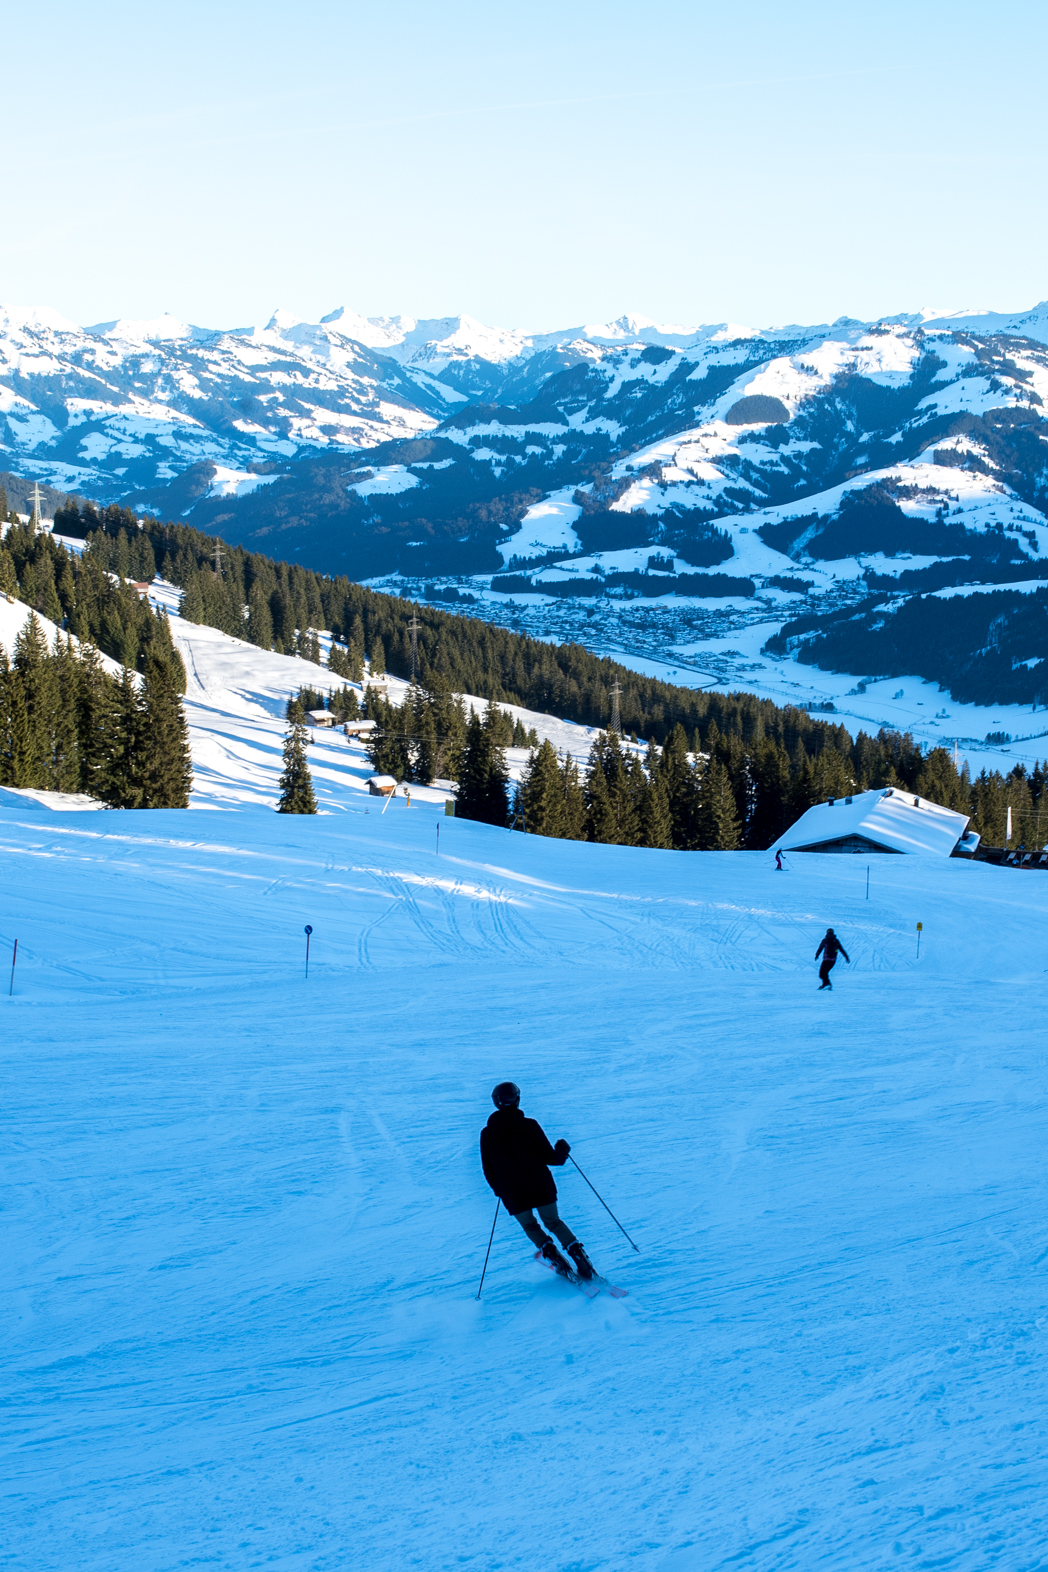 Stacie Flinner Christmas Ski Kitzbuhel Austria -7.jpg